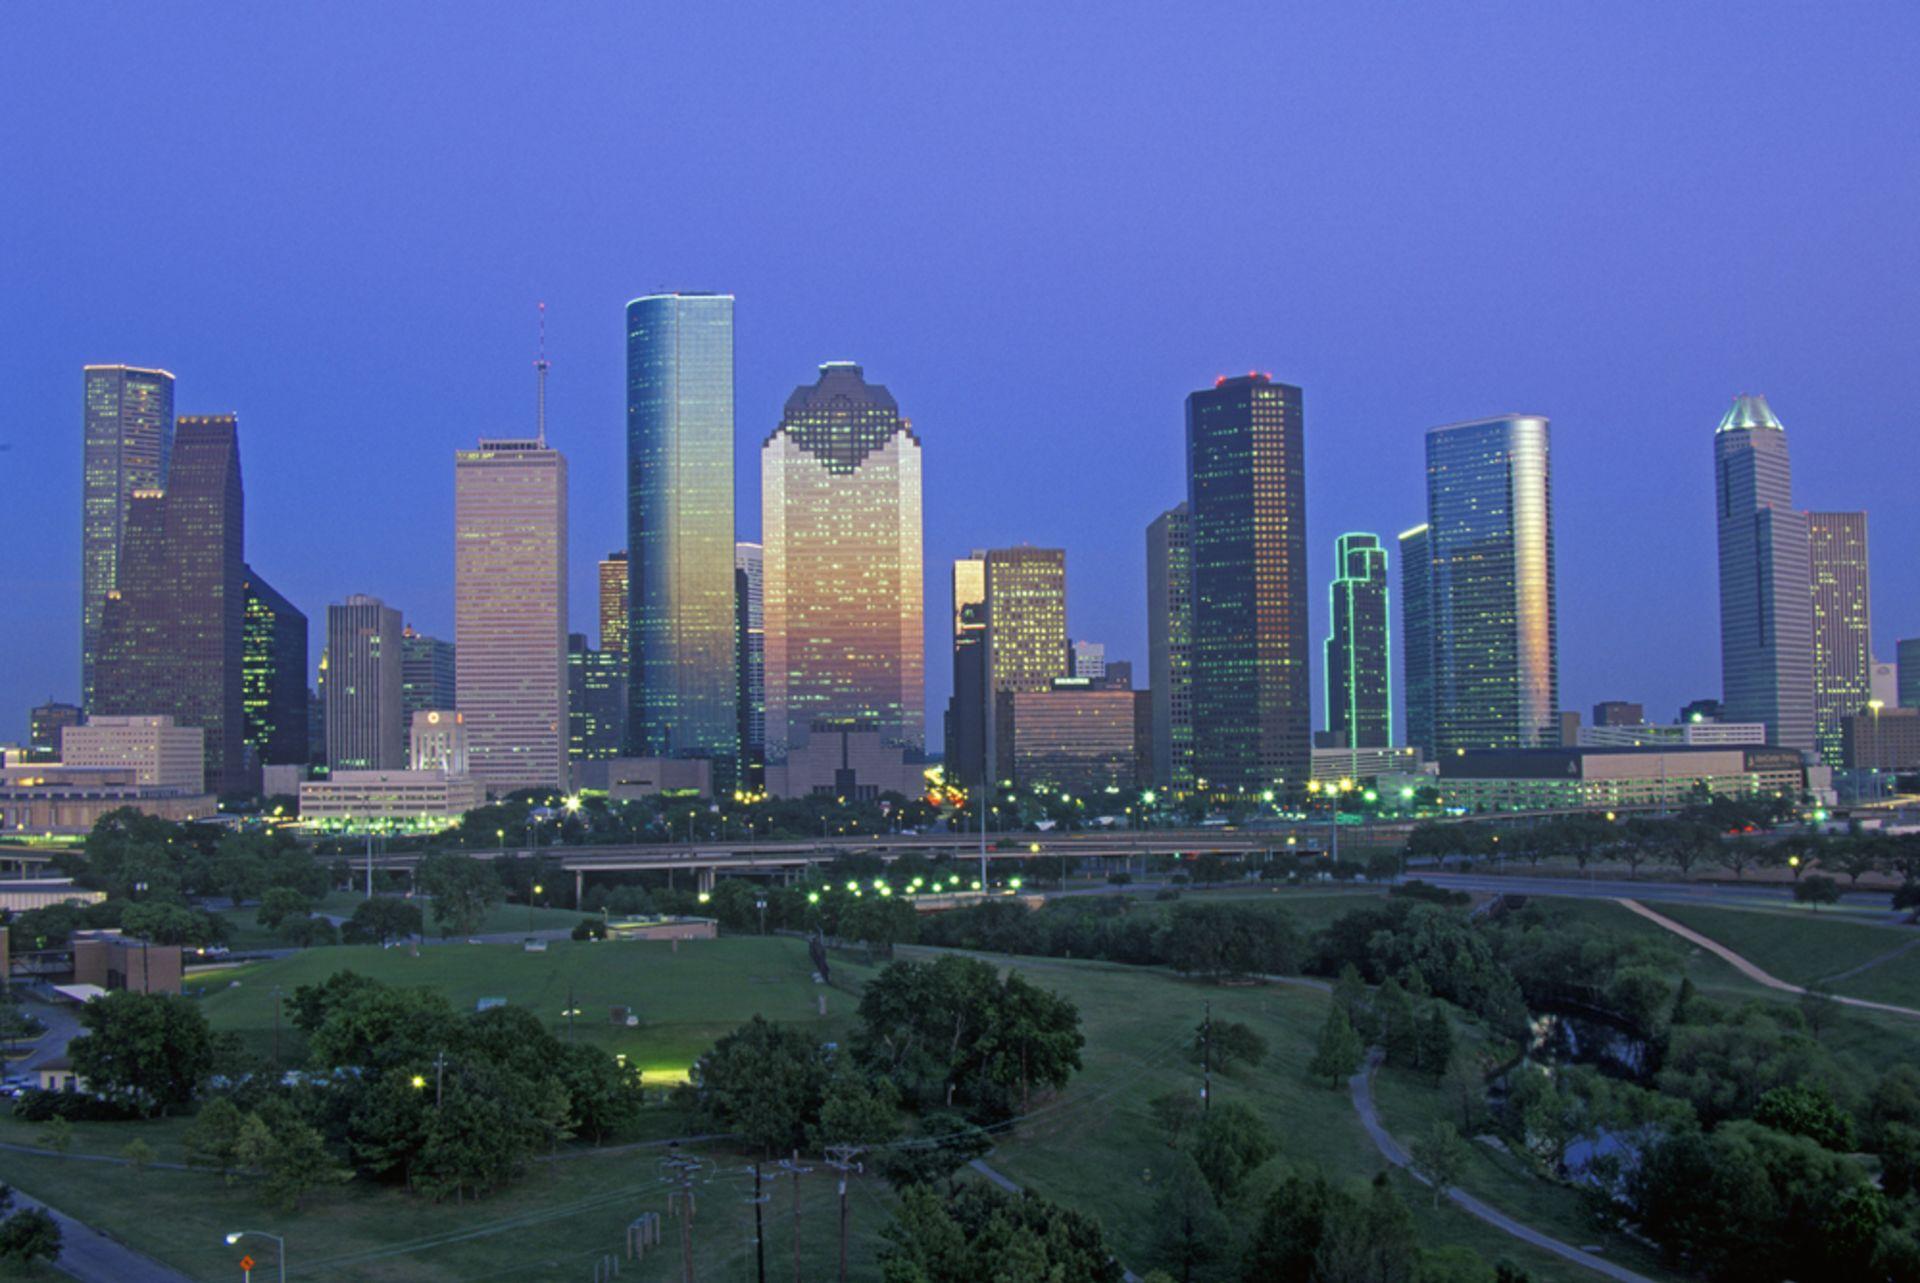 Houston – The Friendly City